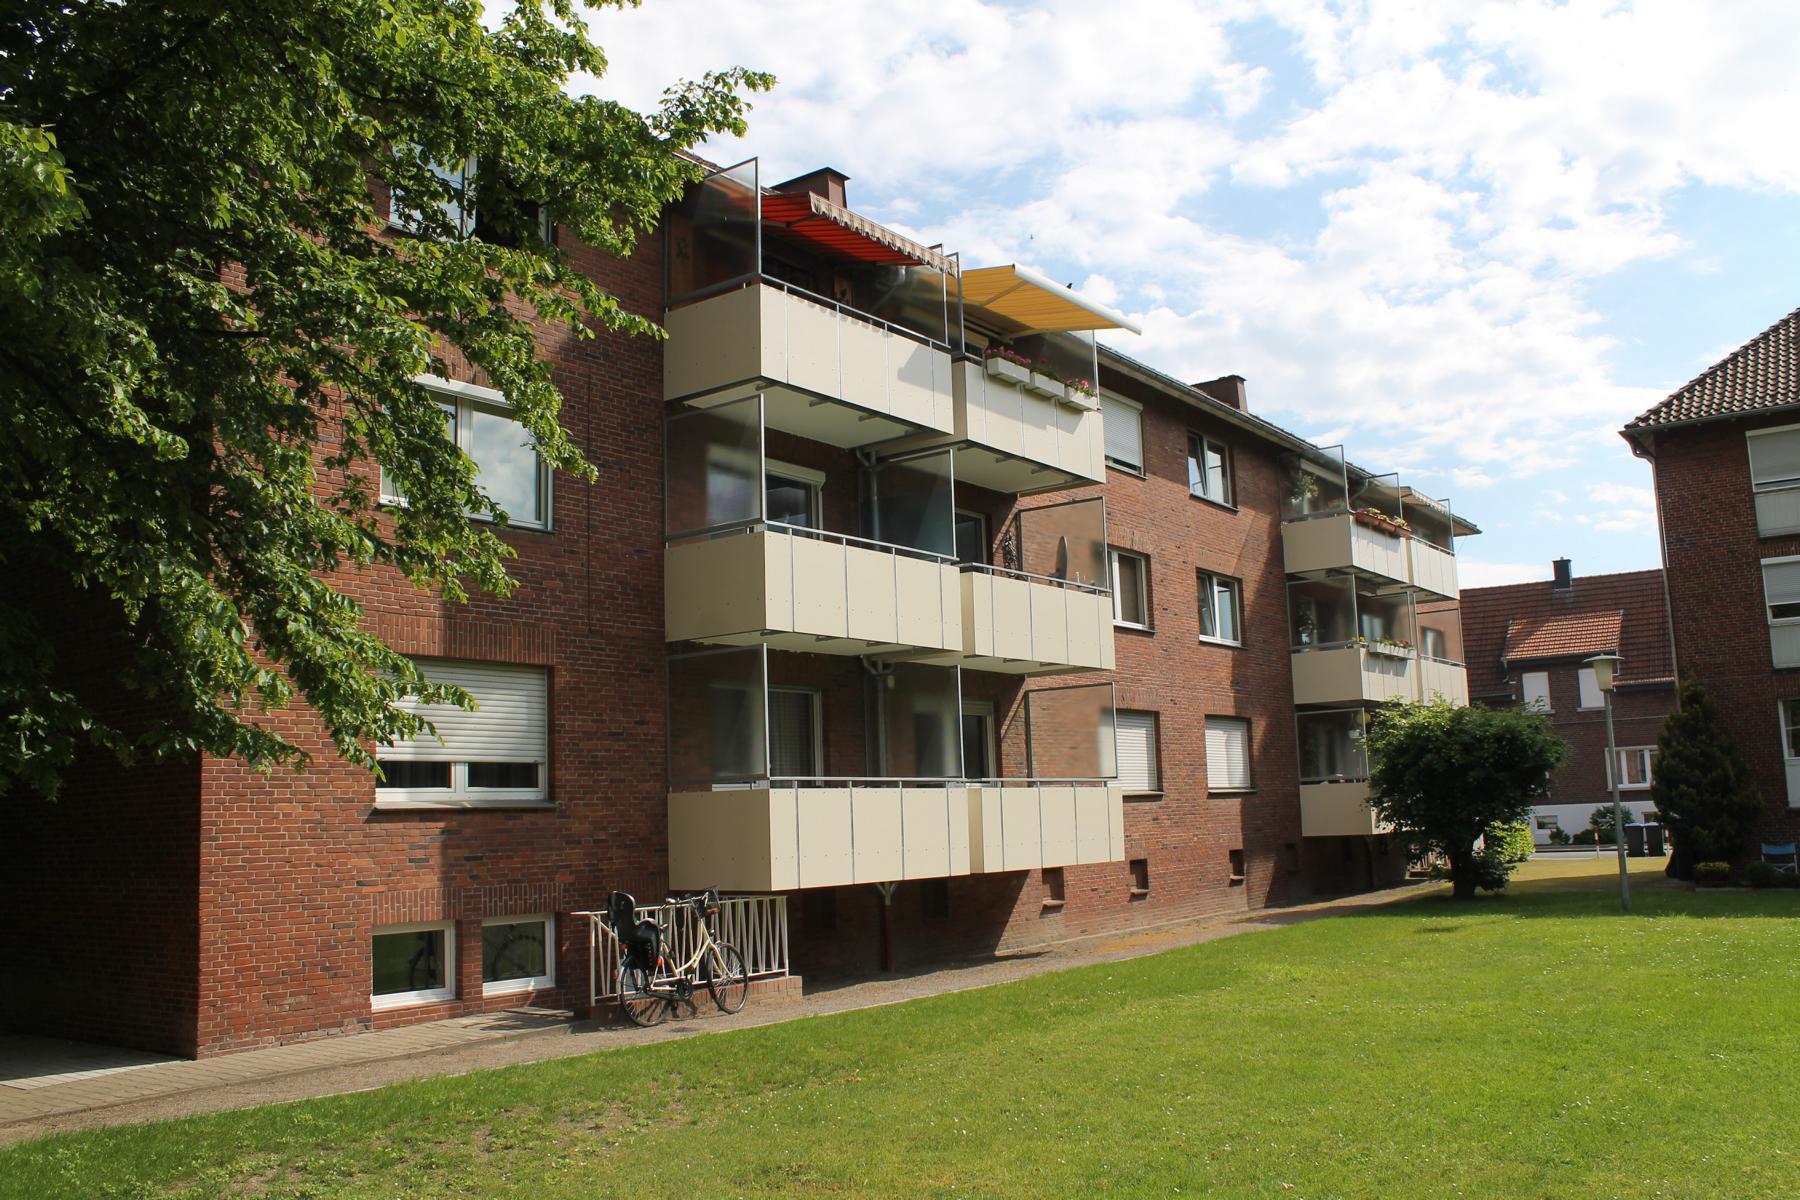 Balkon Sanierung Referenzobjekt 11